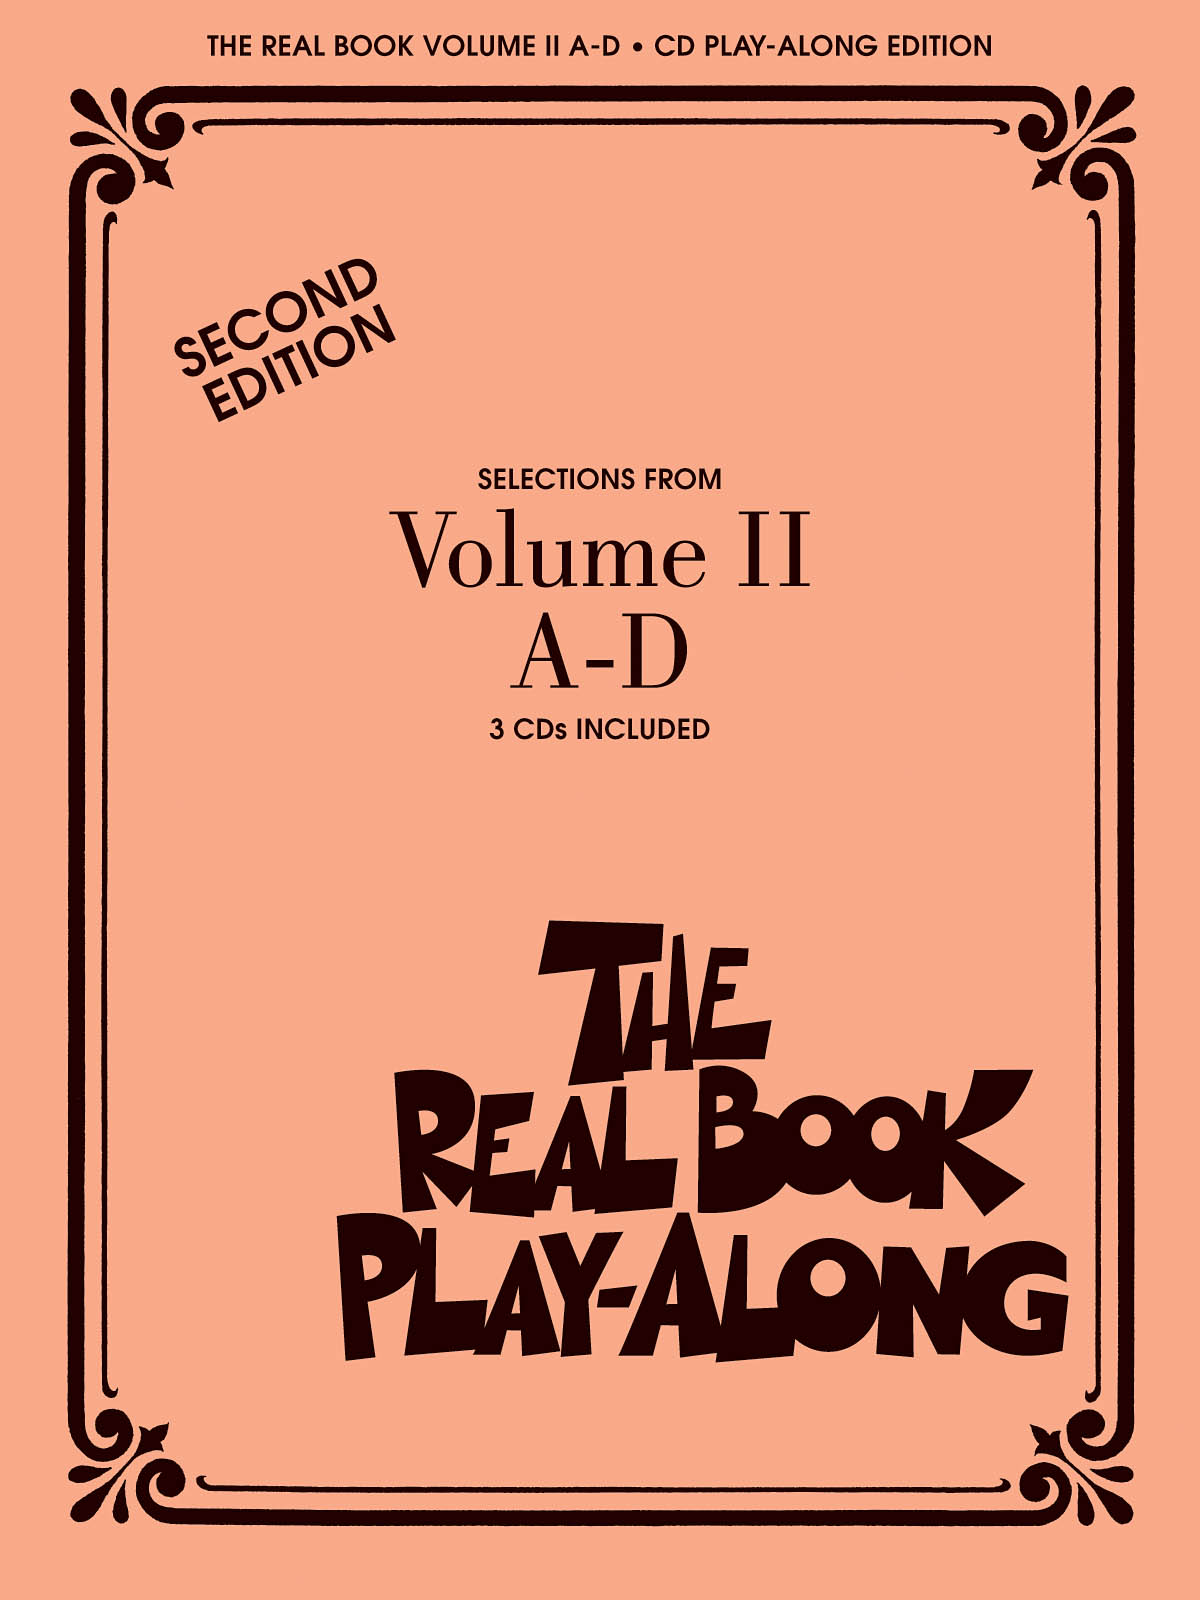 Real Book Play-Along Vol. 2 A-D